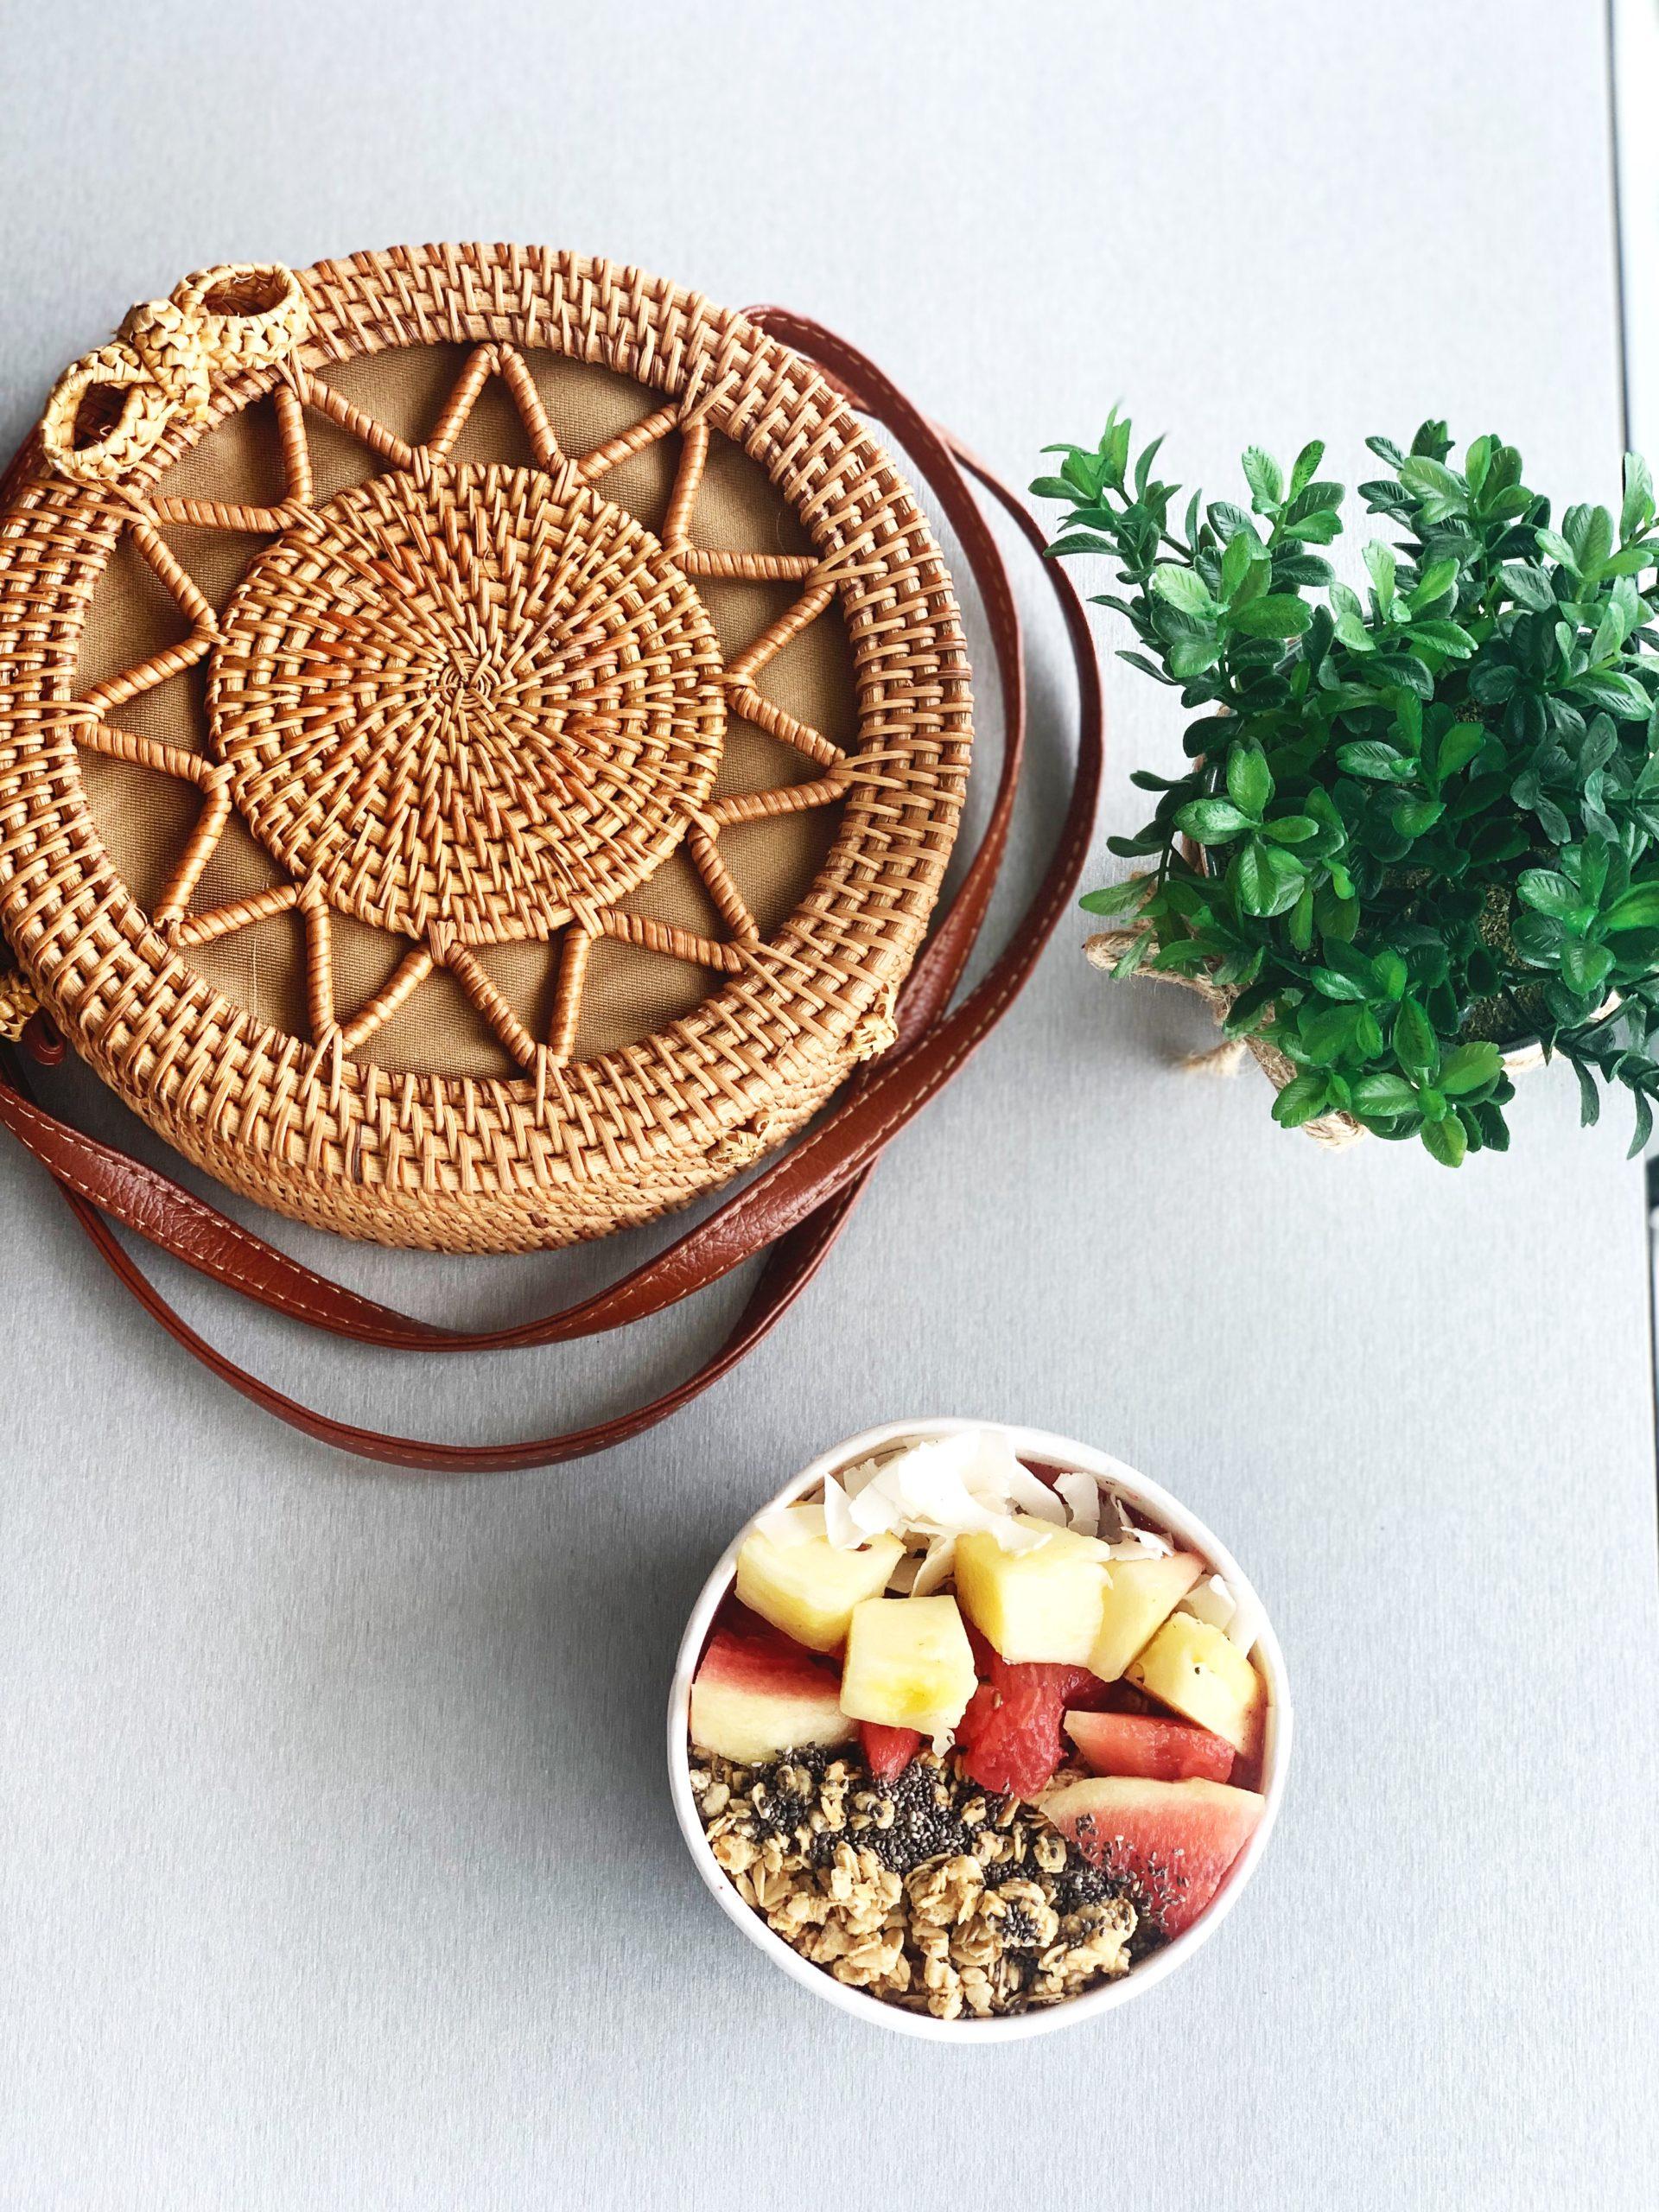 Flat lay of purse, greenery, and acai bowl